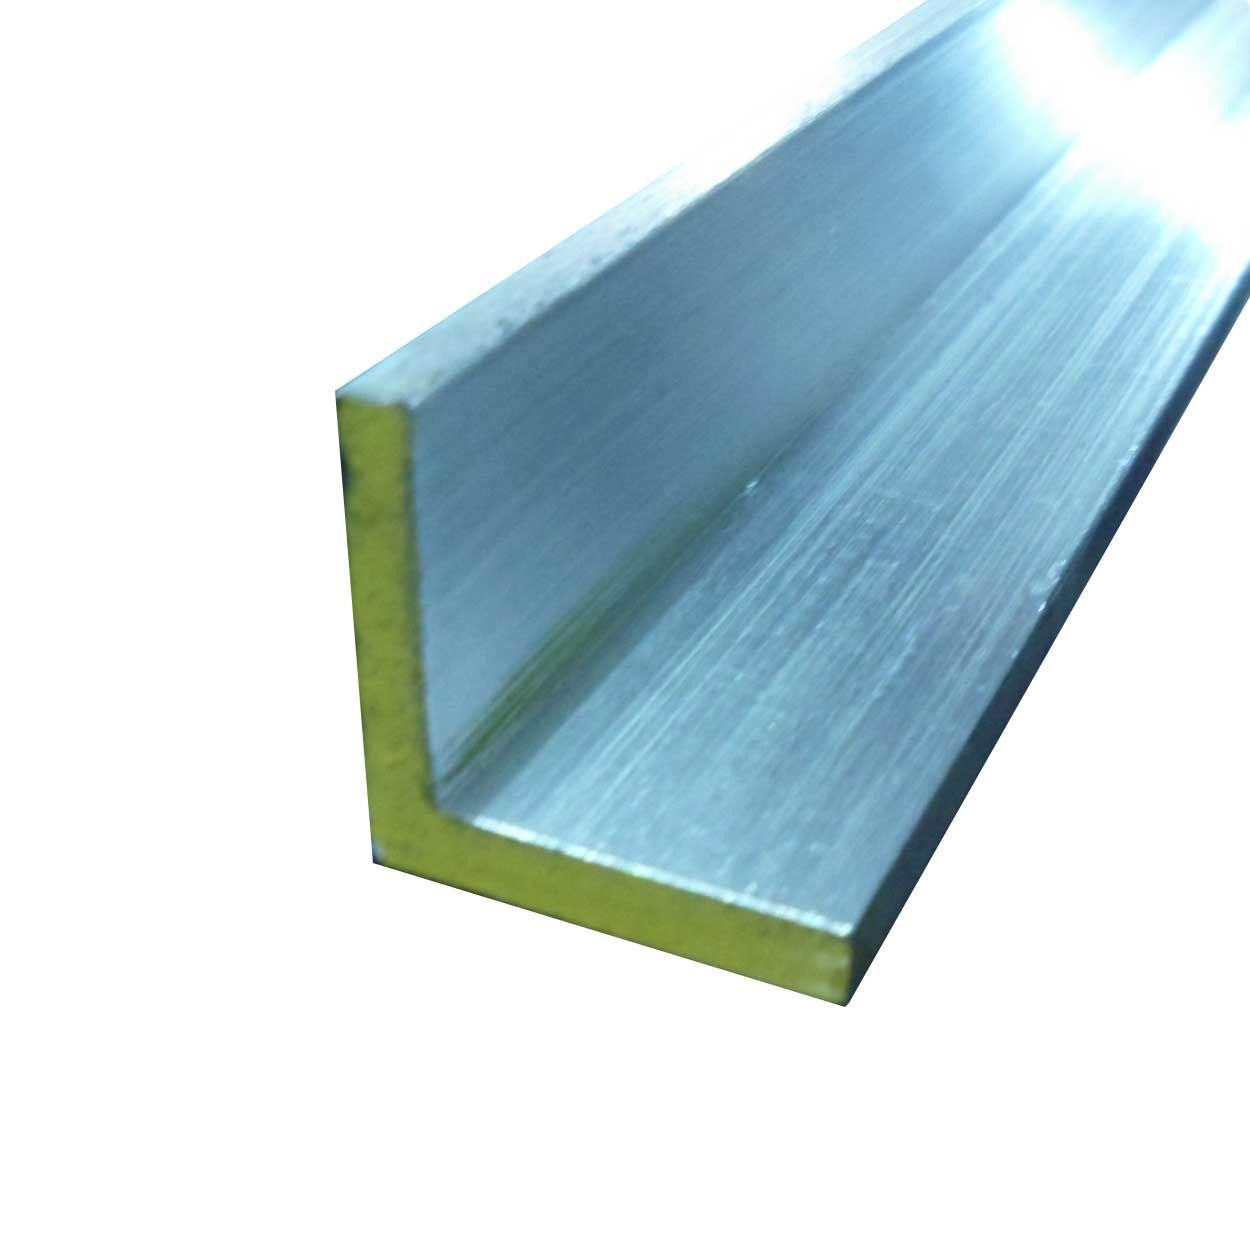 6063 T52 Aluminum Architectural Angle 2 X 2 X 72 1 4